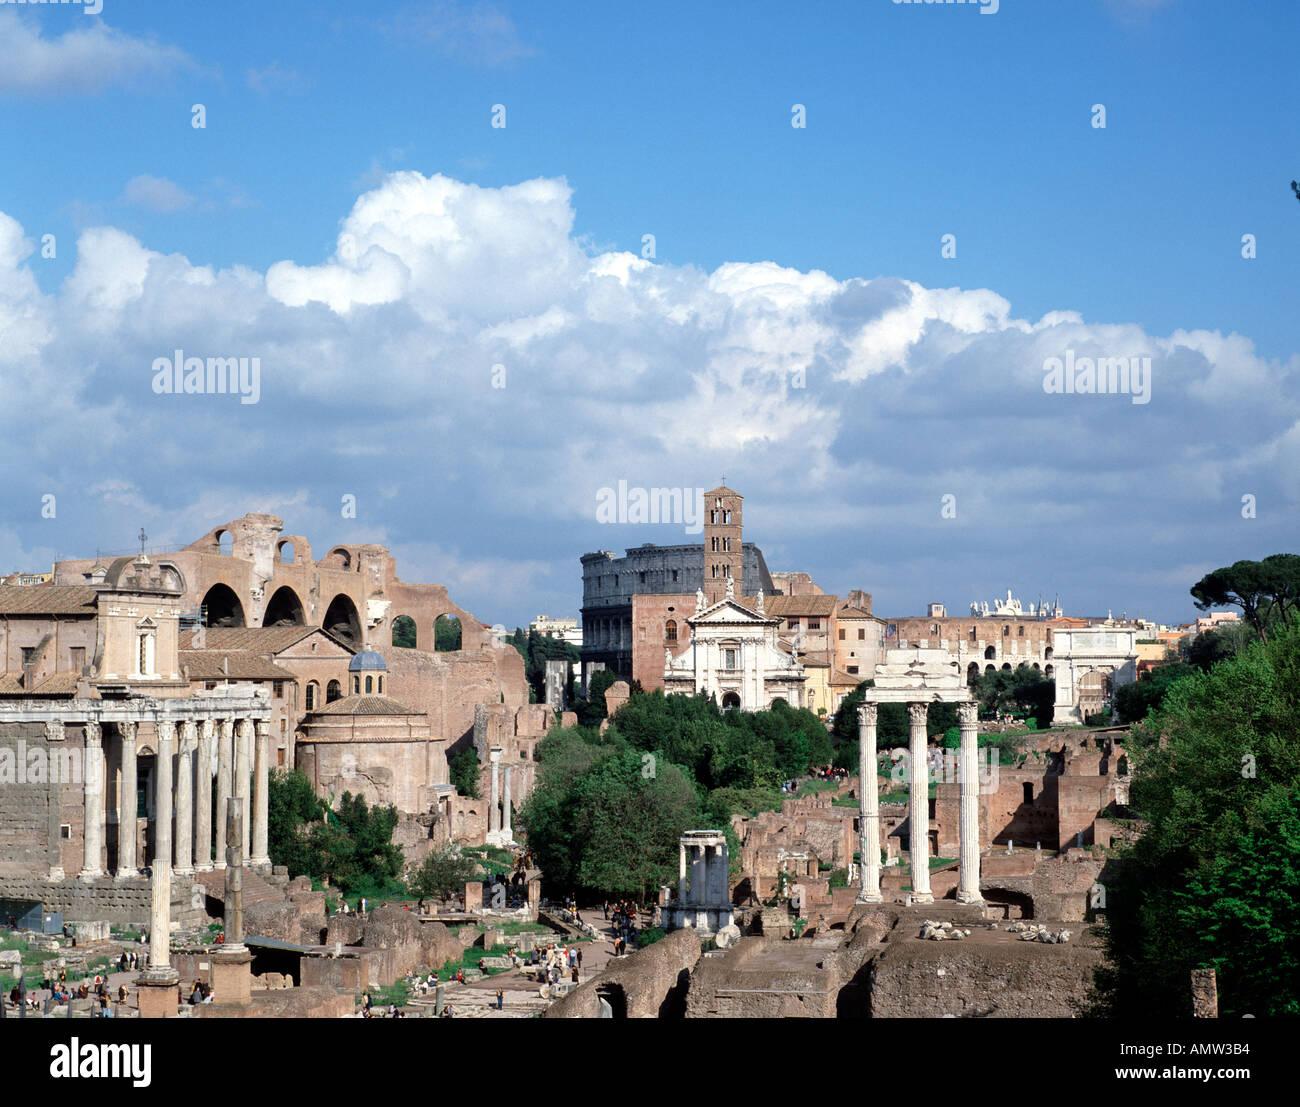 The Forum, Rome, Lazio, Italy - Stock Image